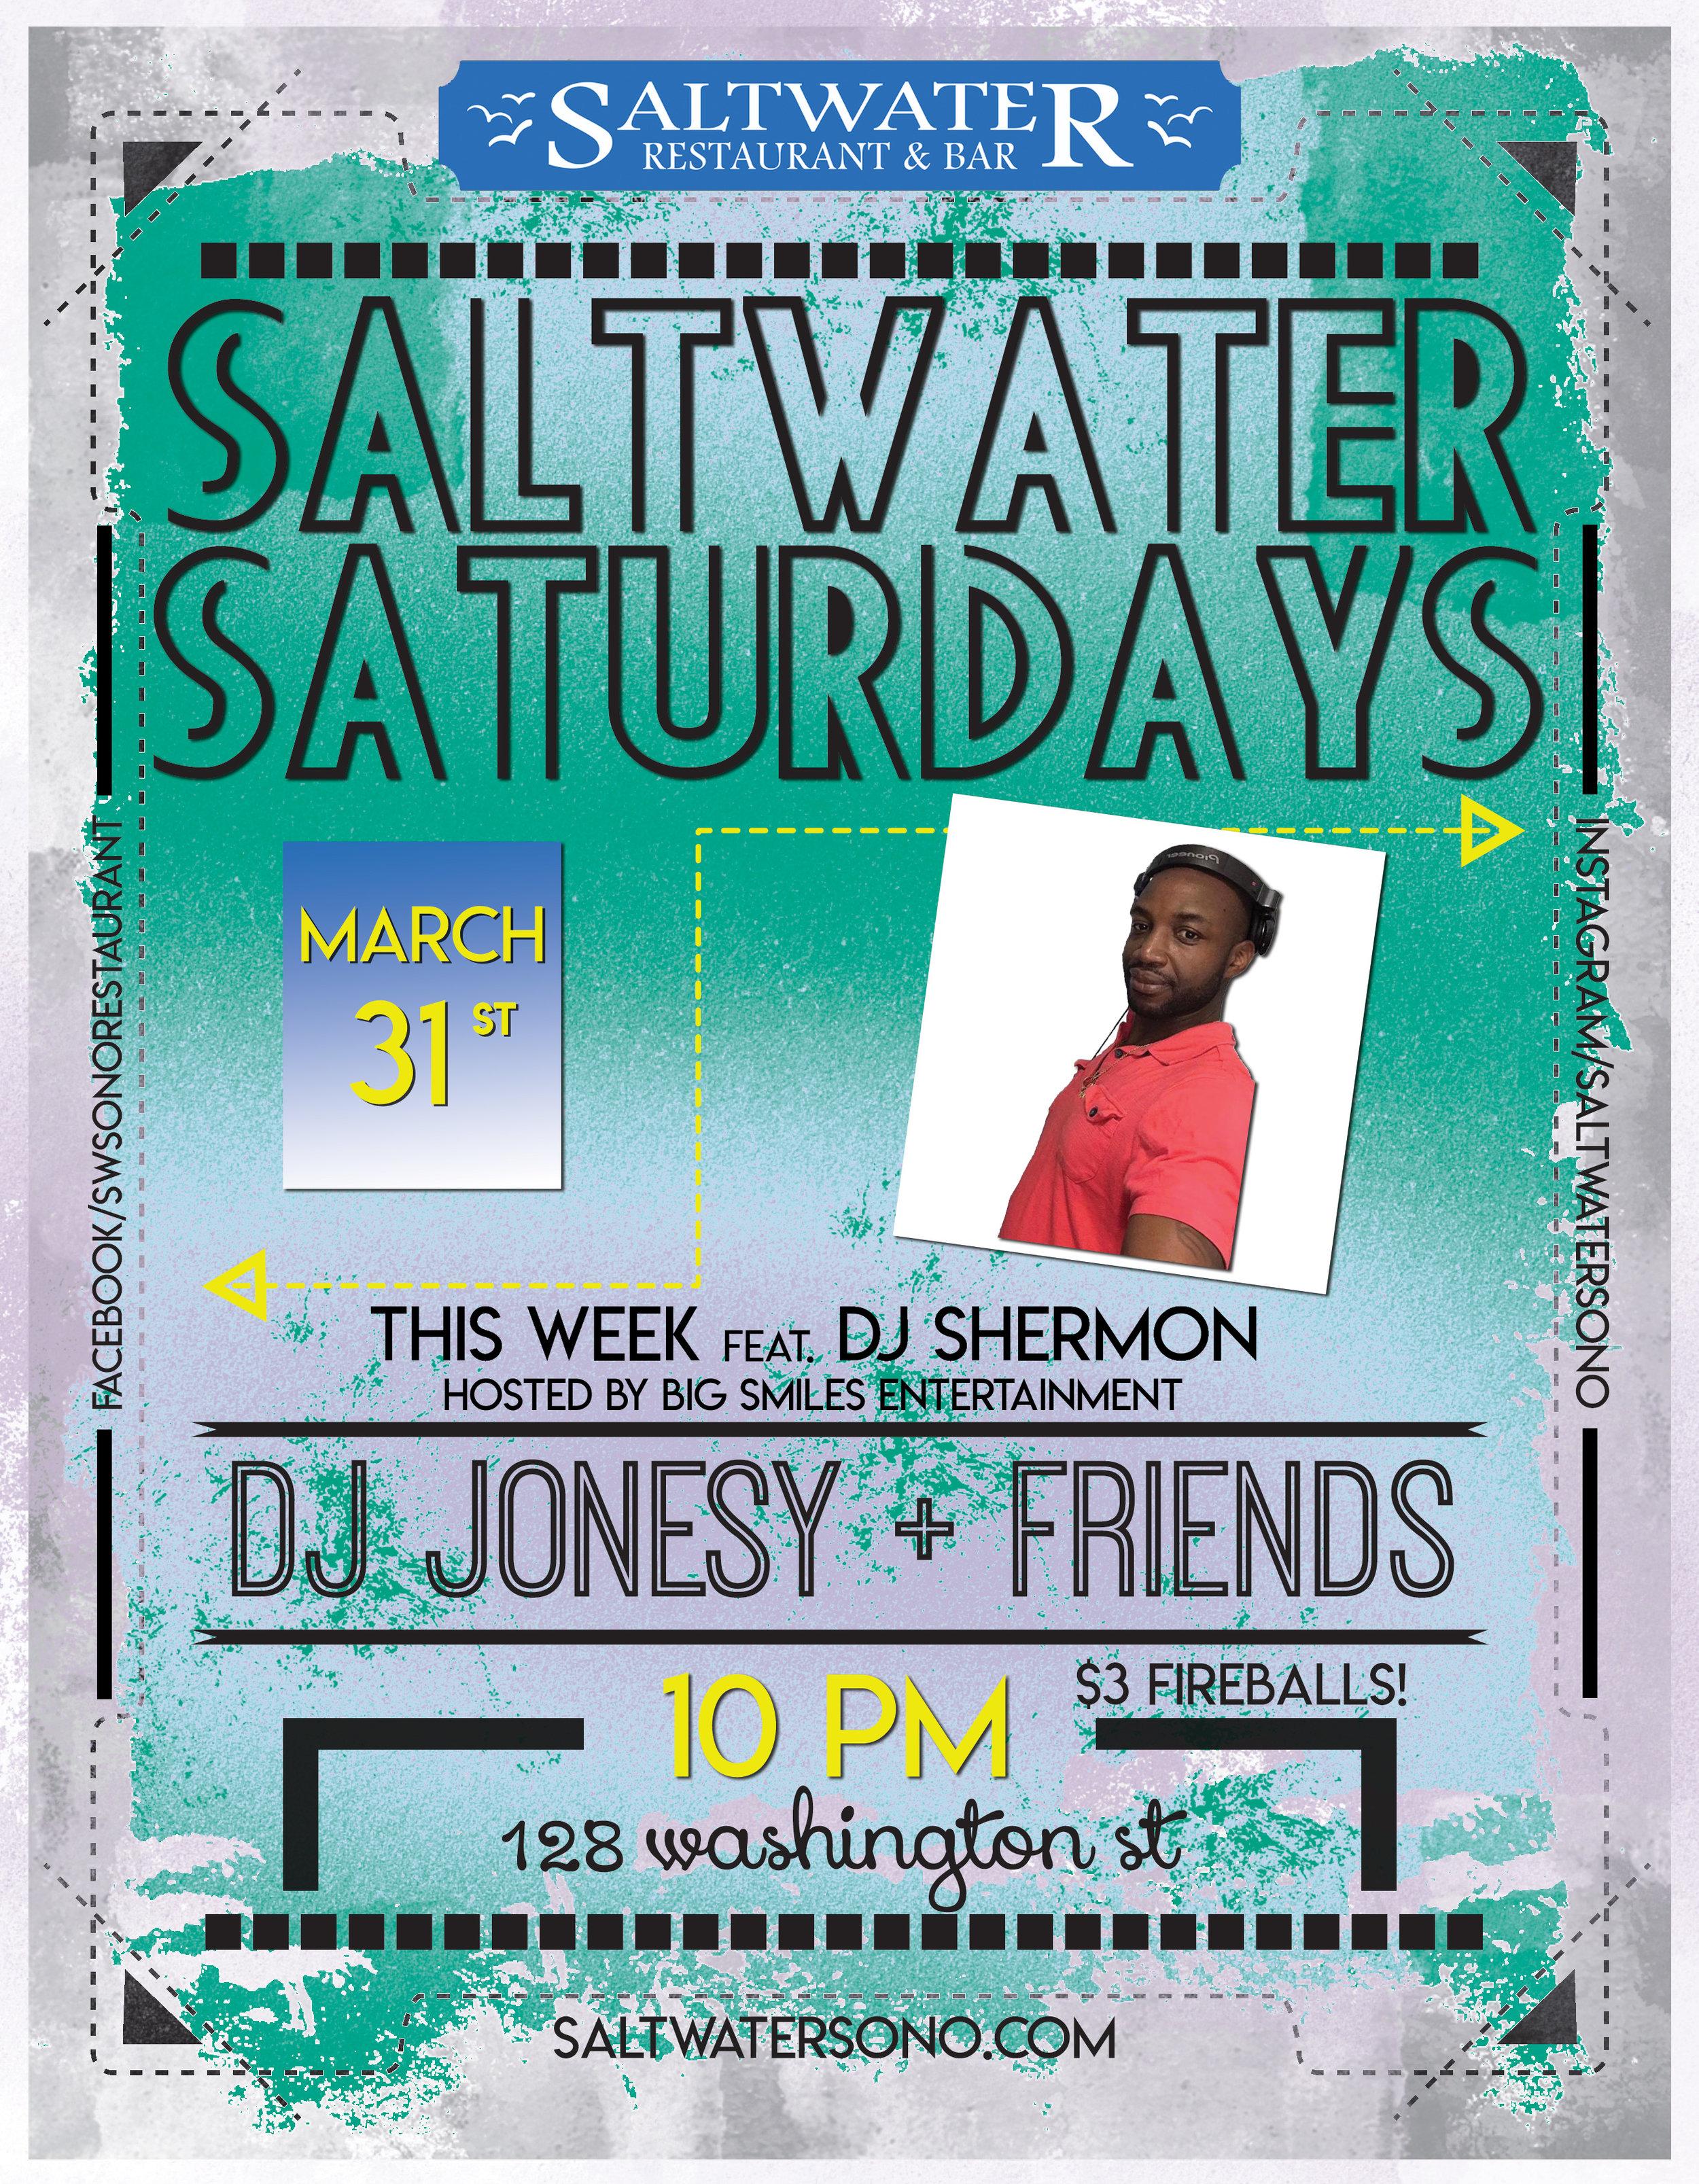 saltwater-saturdays-shermonMARCH31.jpg